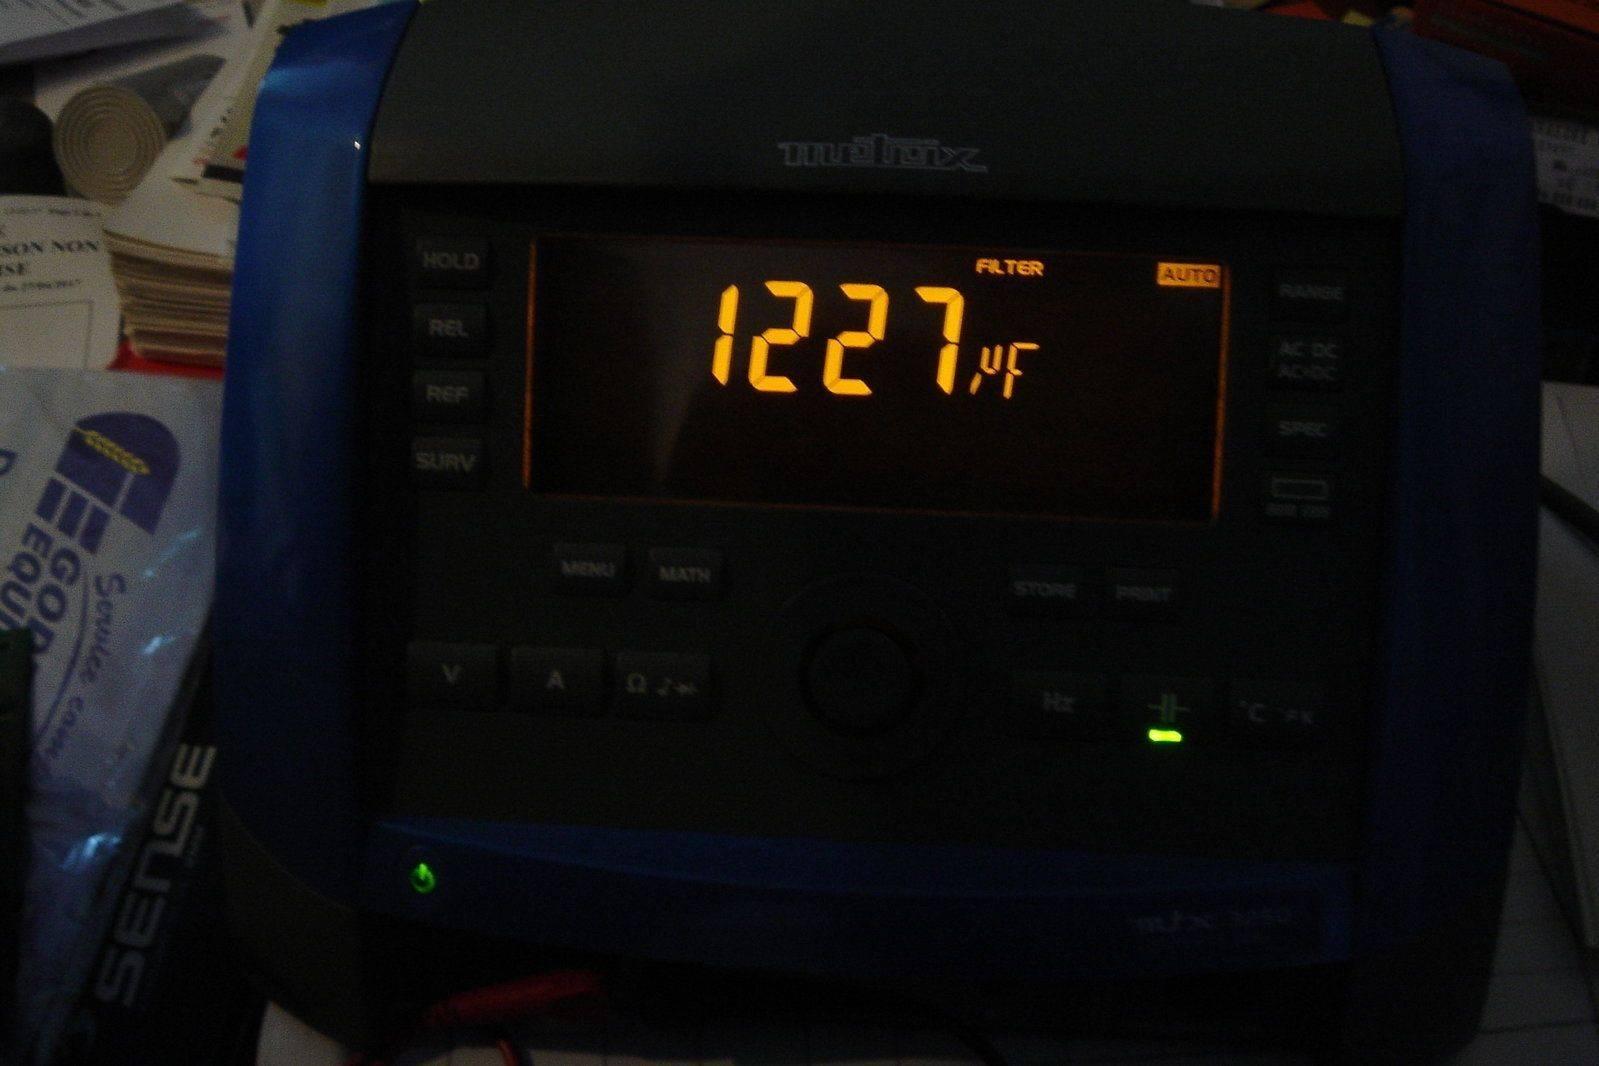 DSC04739.JPG